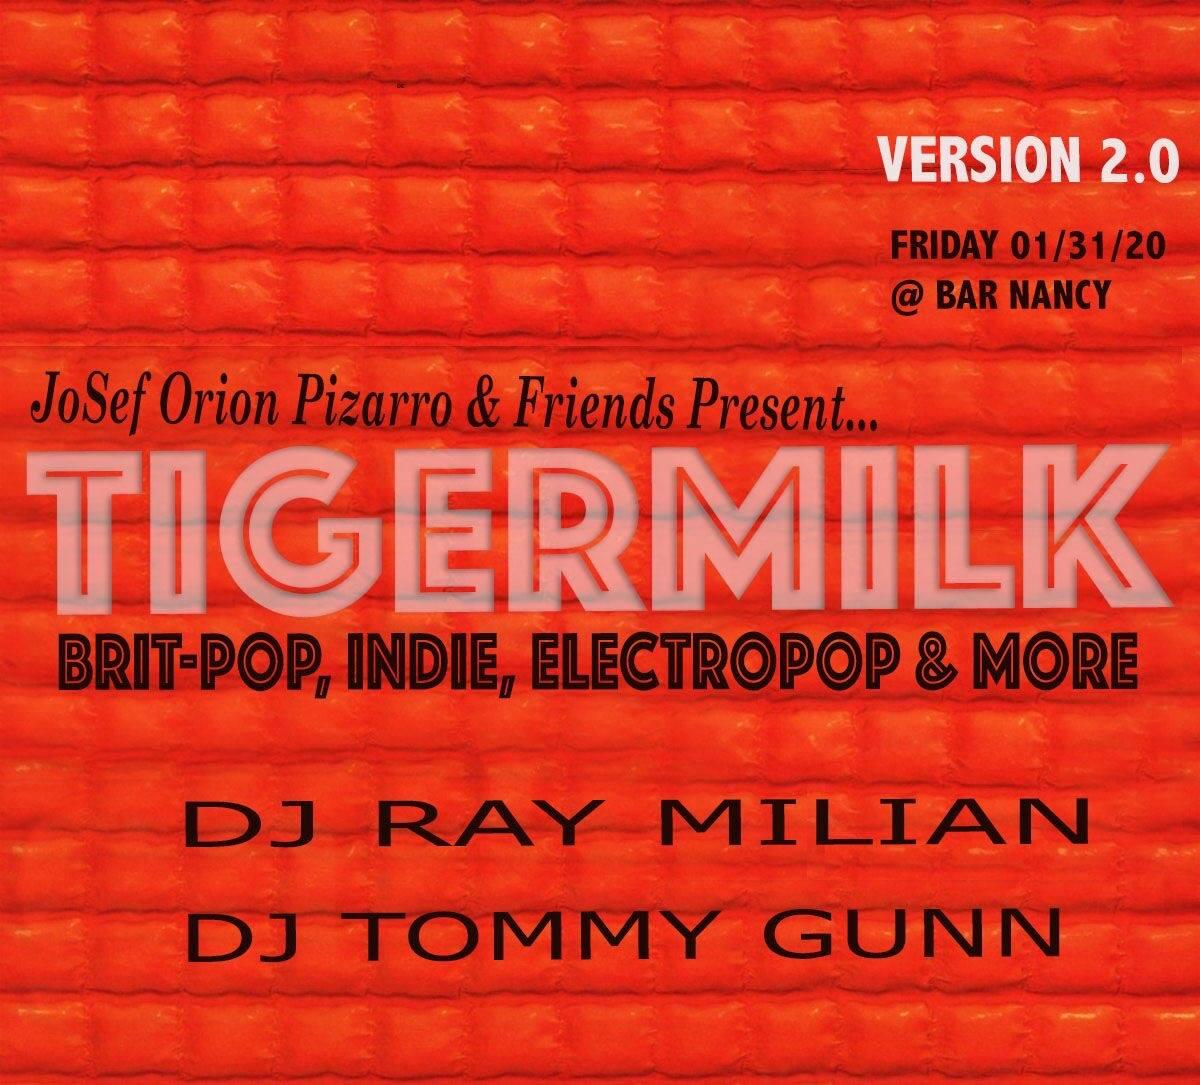 Tigermilk 2020 - 2 Year Anniv. Pop-Up Party @ Bar Nancy